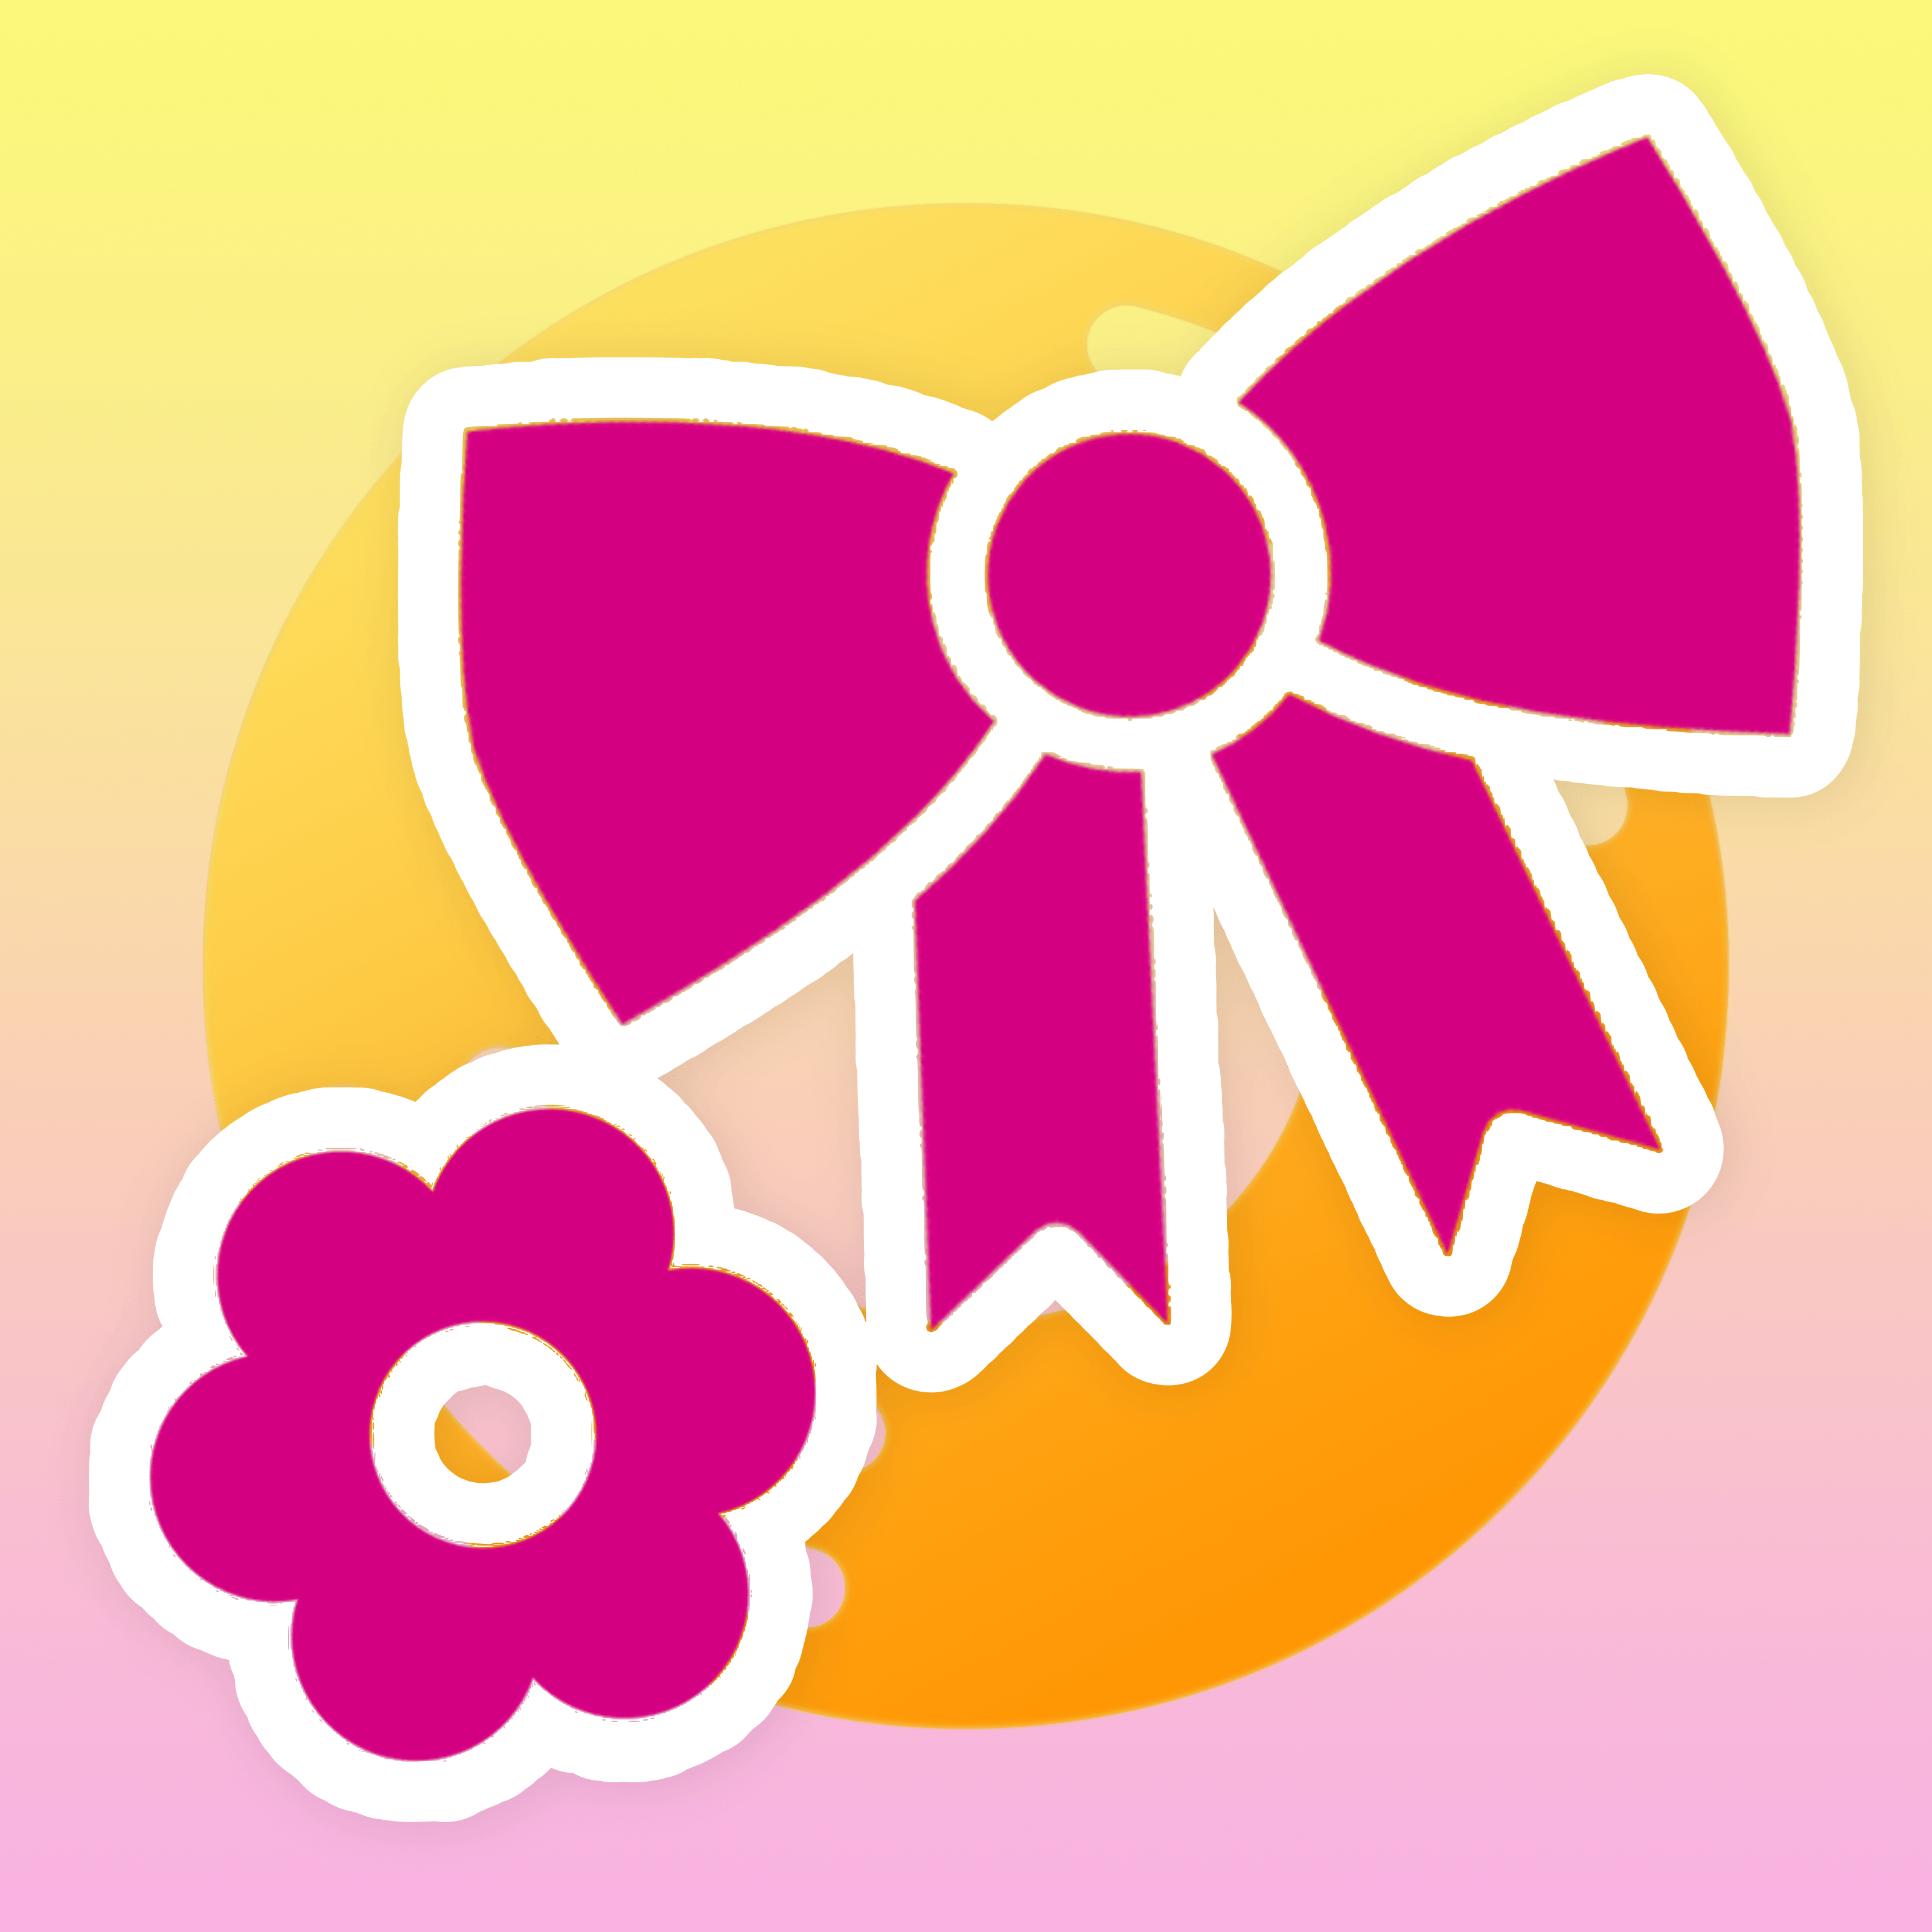 Maytee2013 avatar